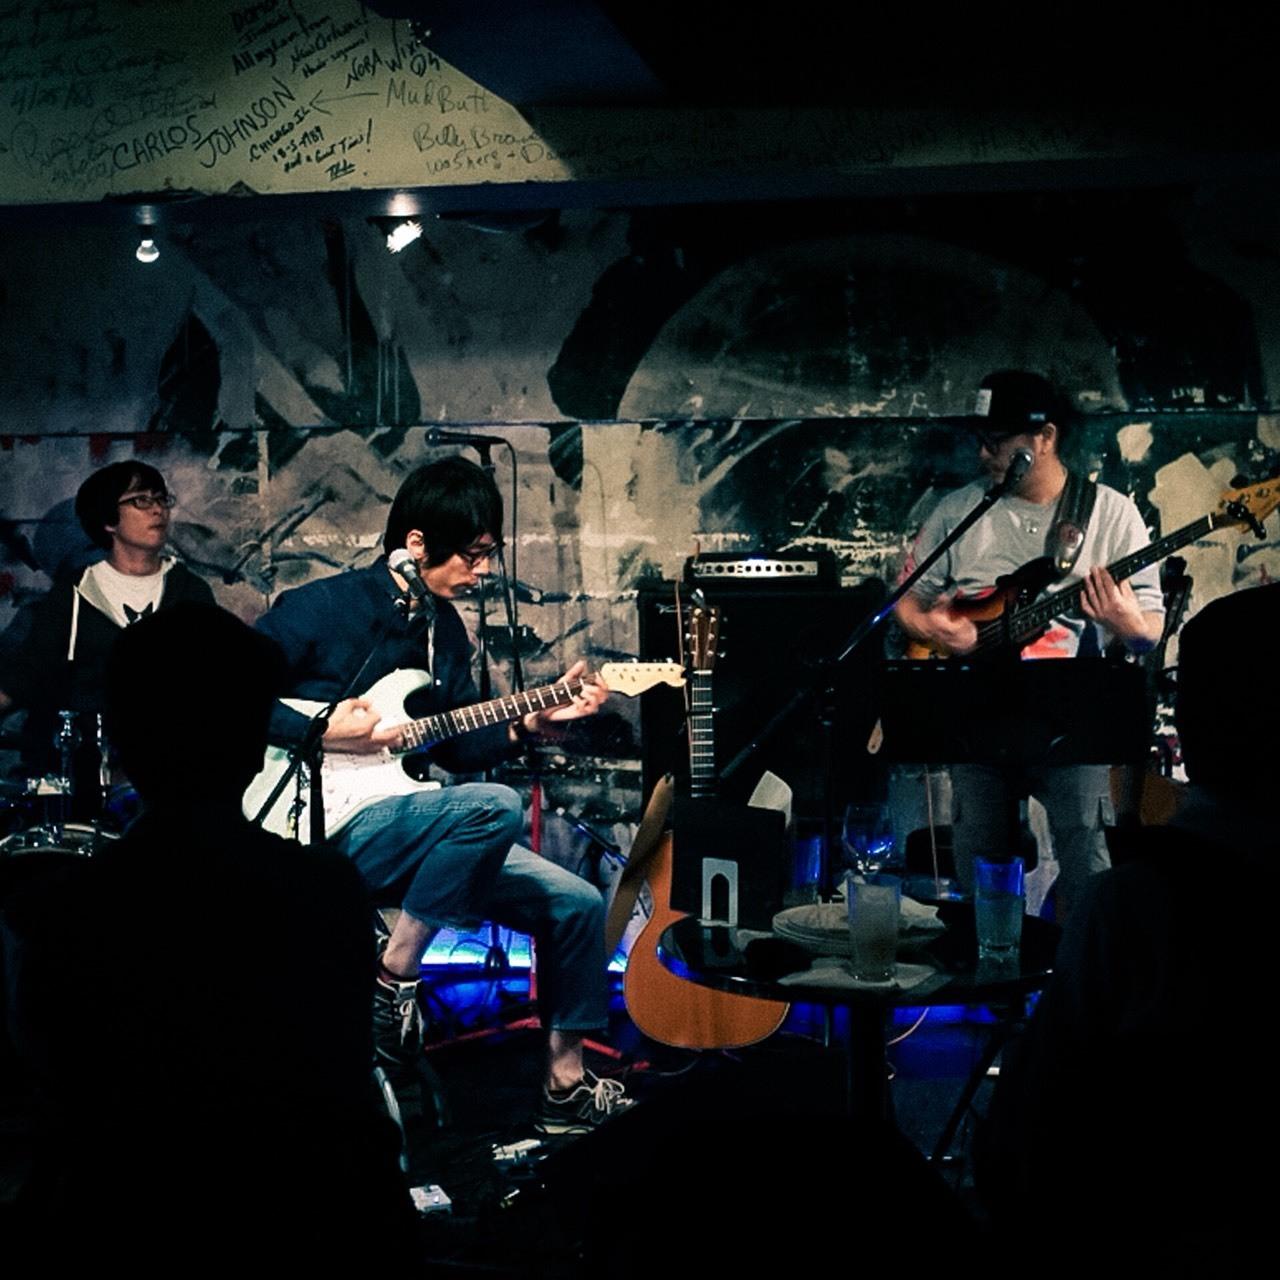 『Floating Strings』リリースライブ、ありがとうございました!_d0110708_10432032.jpg